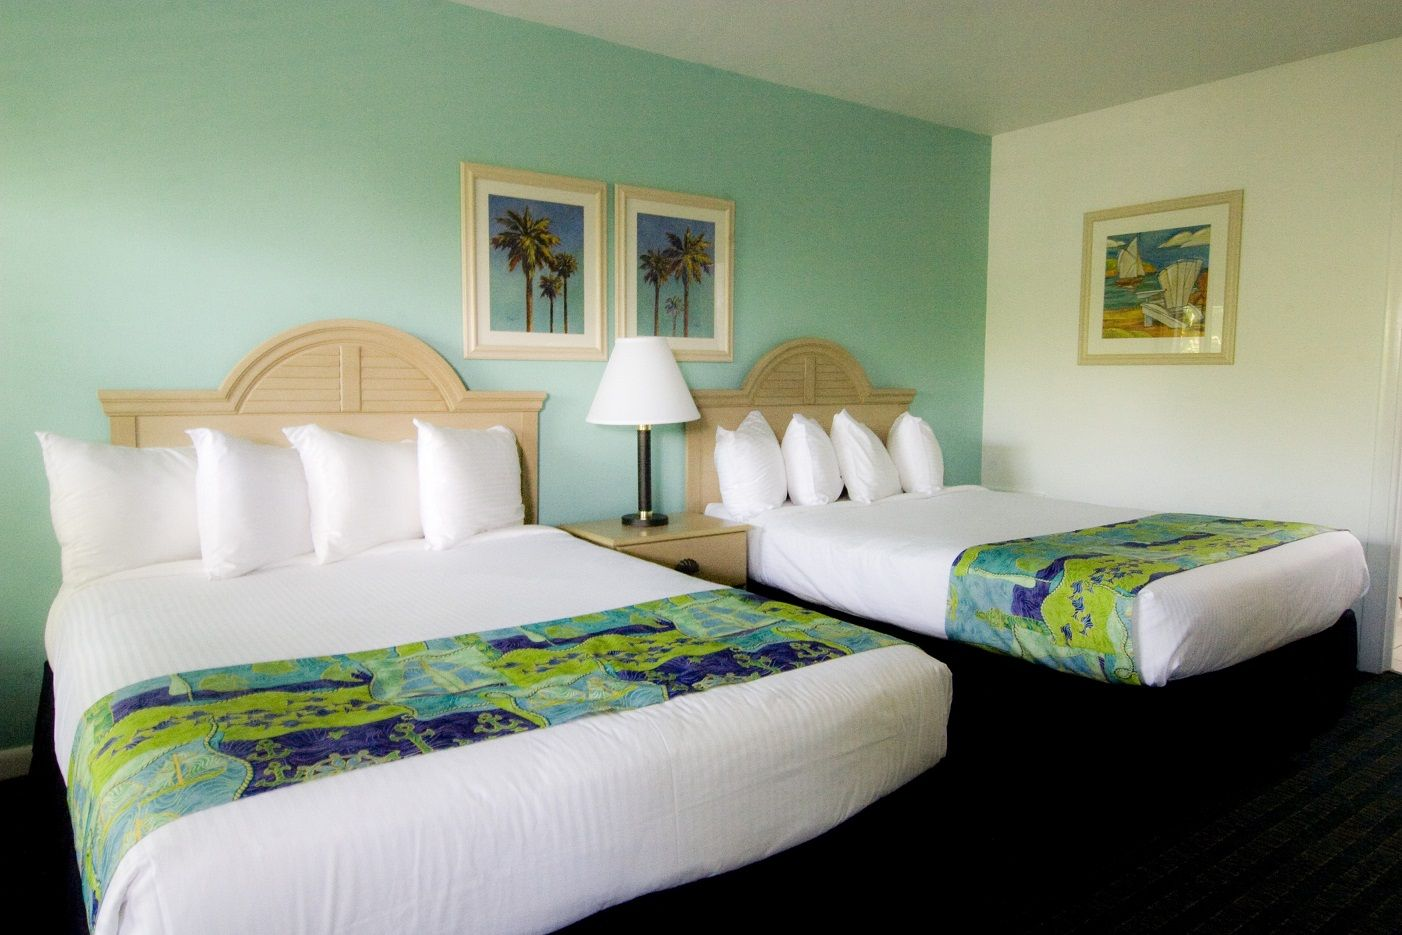 Bon Aire Resort St. Pete Beach Hotels room, Room, Hotel